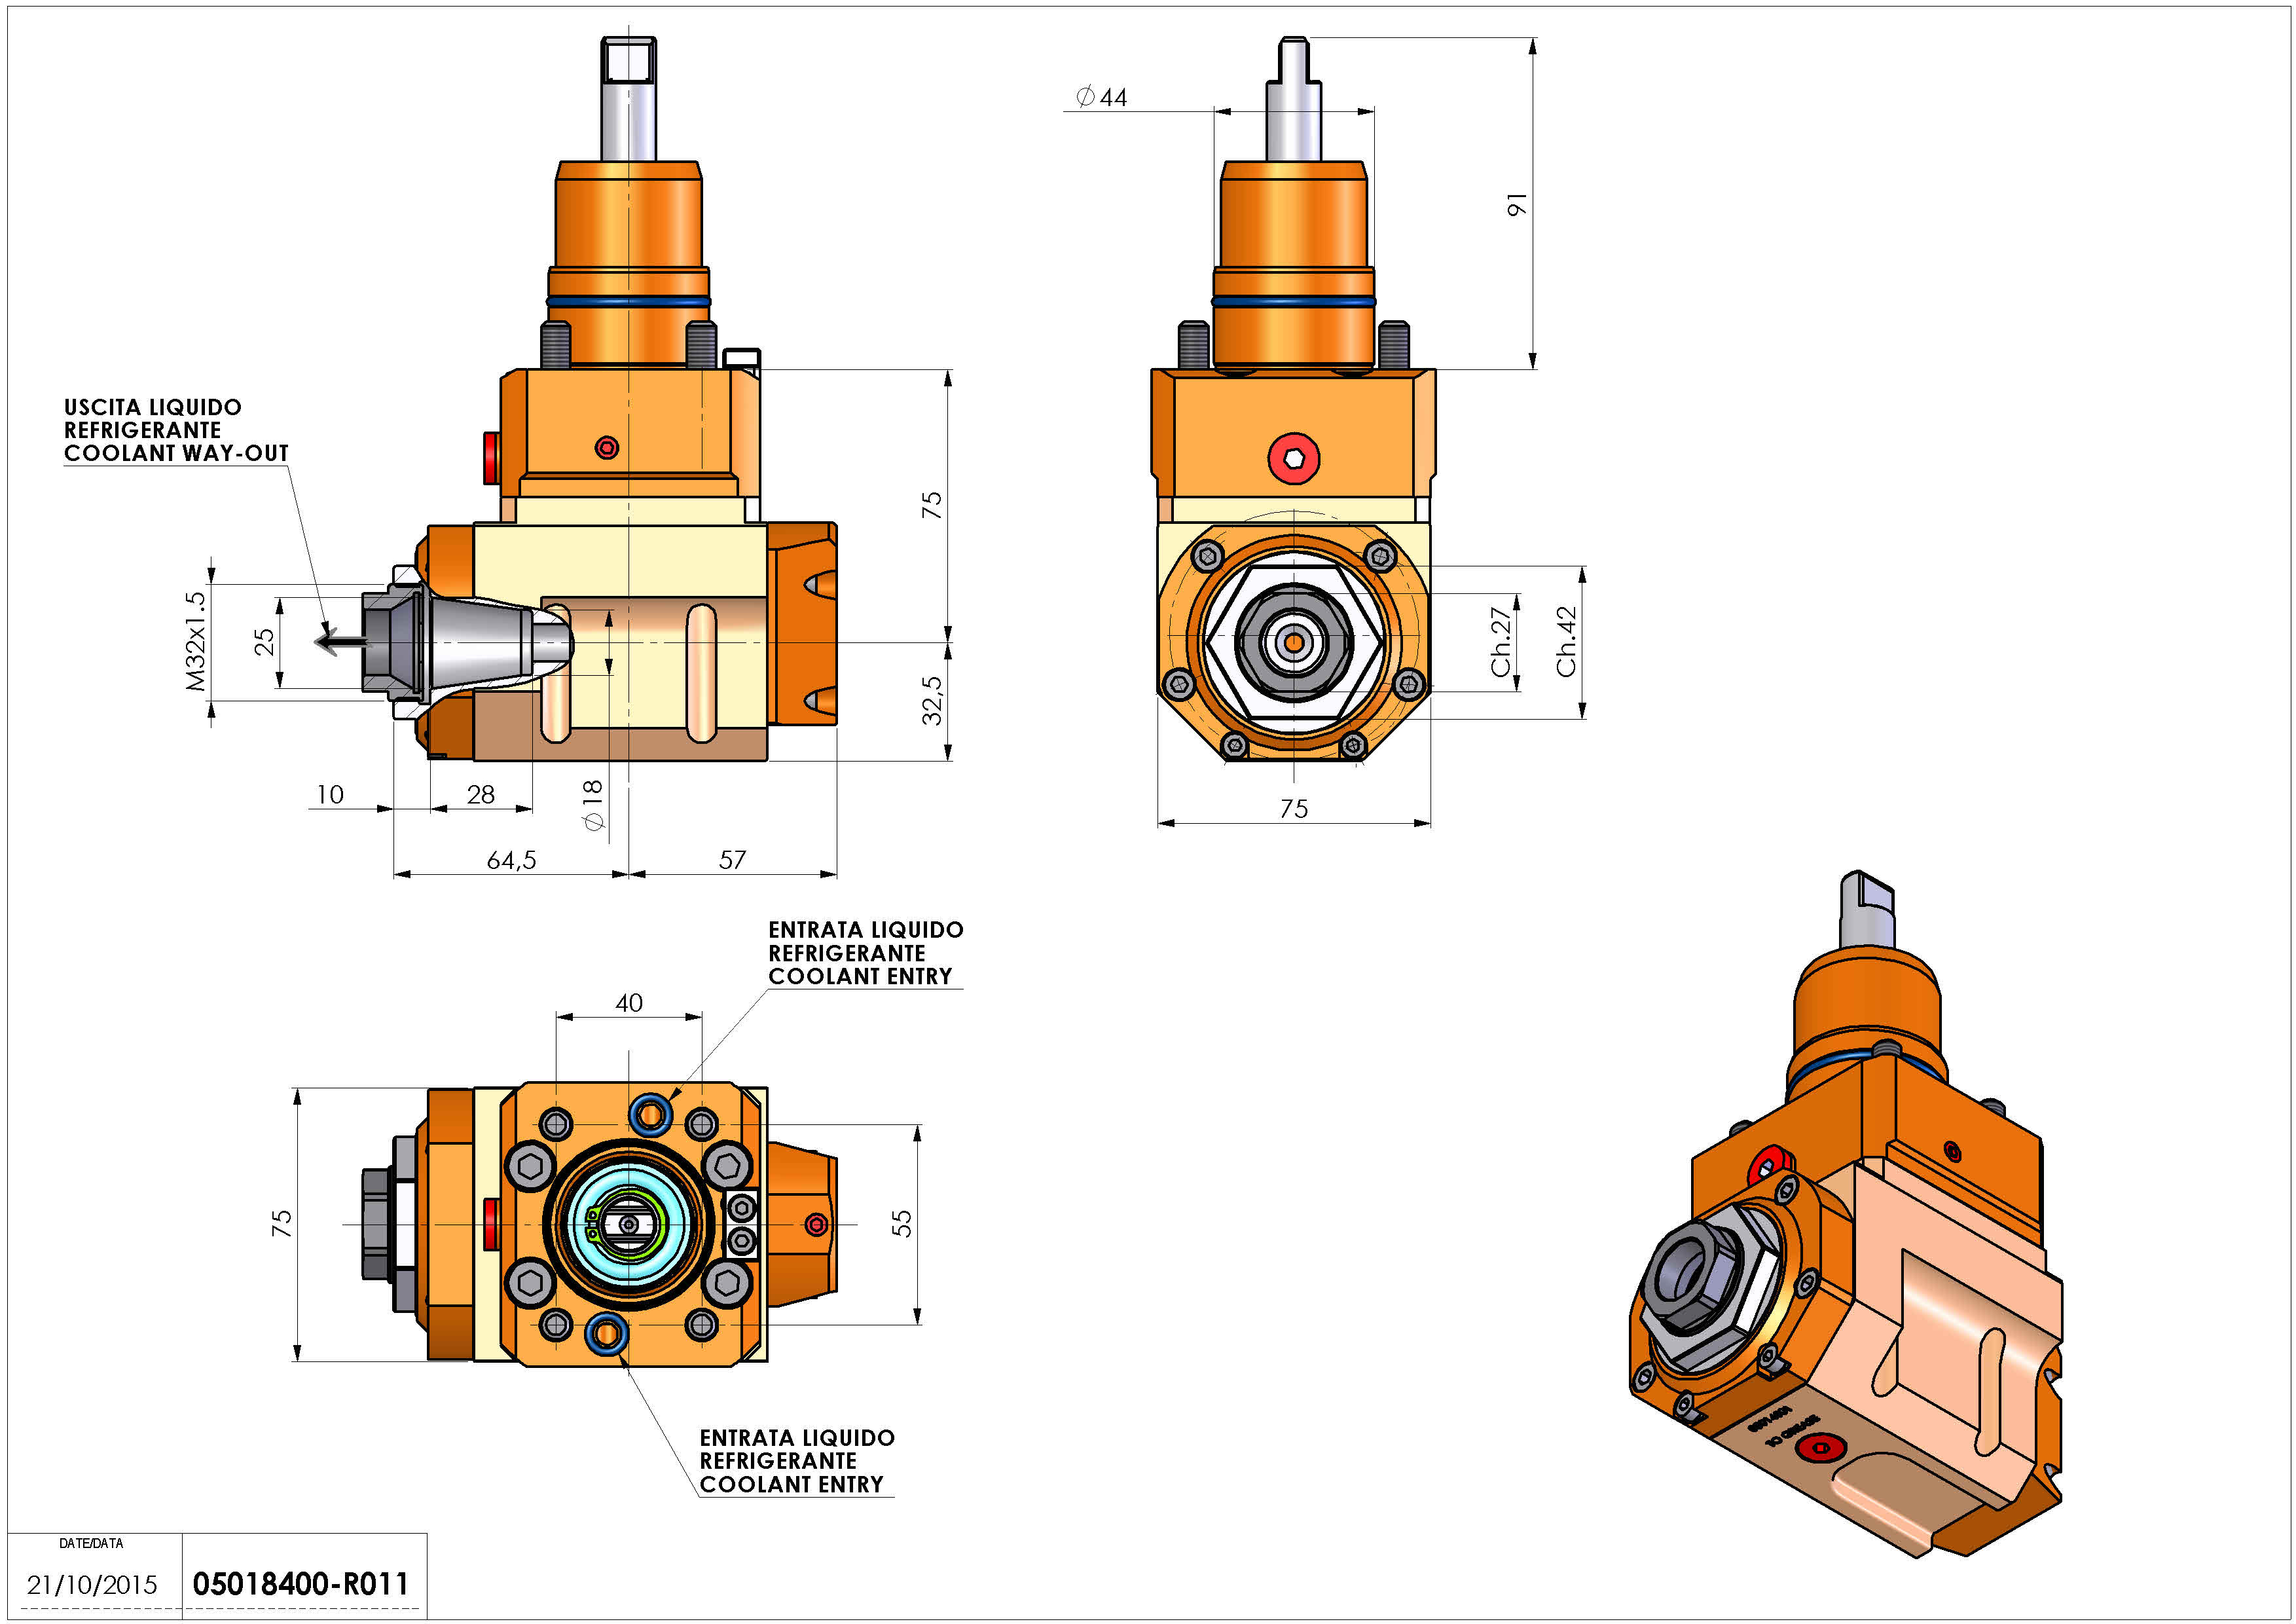 Technical image - LT-A D44 ER25F L-R RF H75 NK.